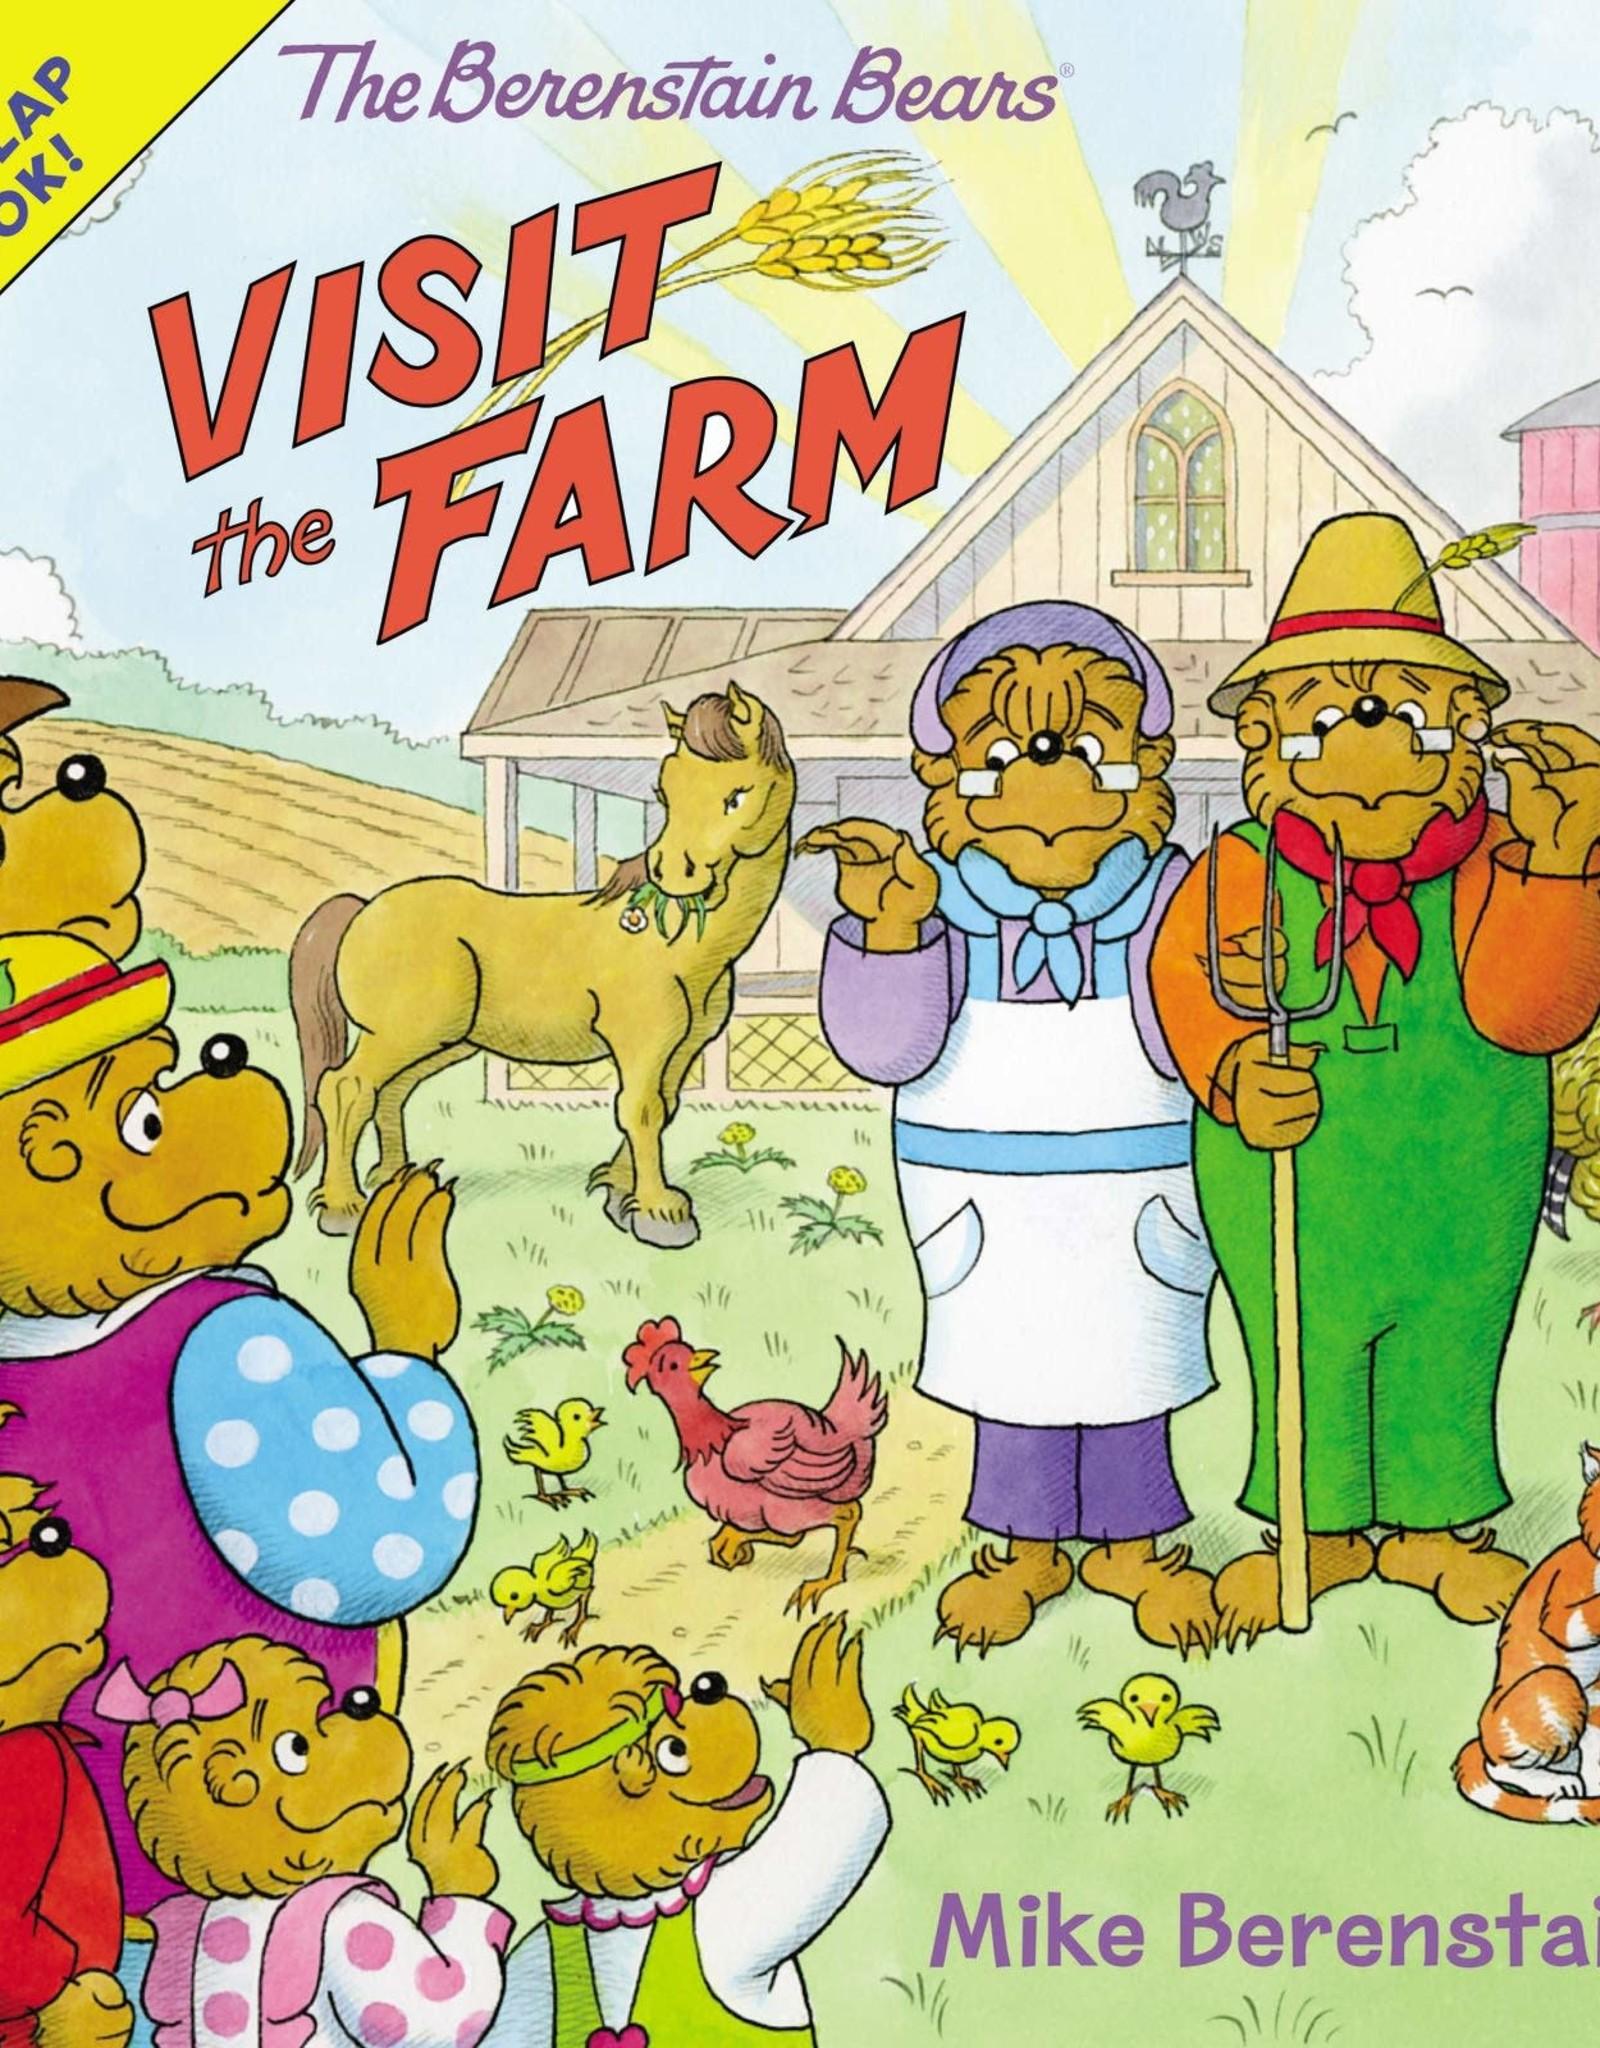 Berenstain Bears Visit the Farm